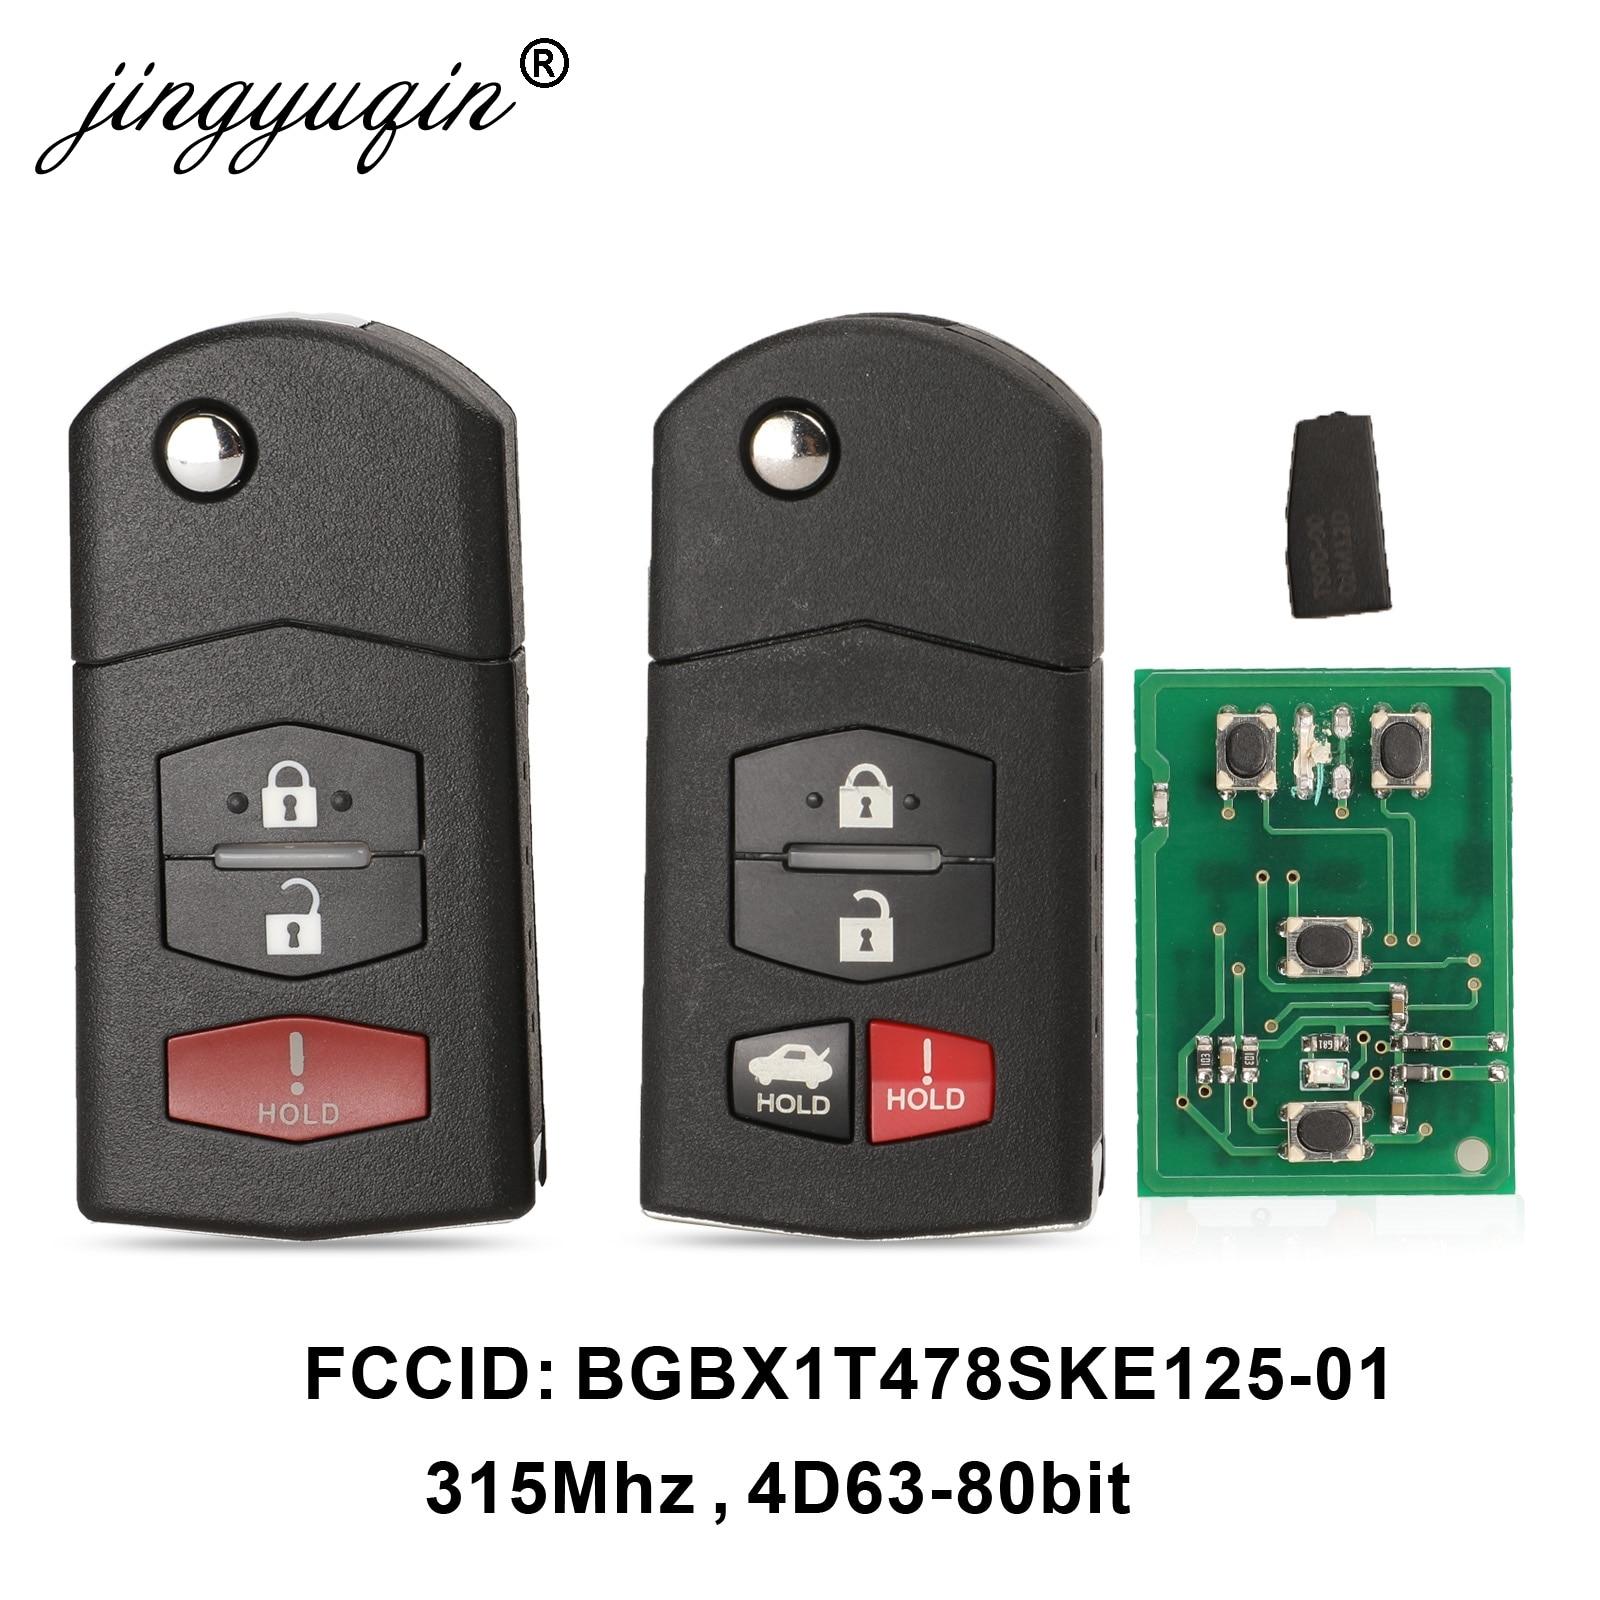 Jingyuqin 3/4 кнопки дистанционный складной Автомобильный ключ 315 МГц для Mazda 3 5 6 CX-7 CX-9 Miata MX-5 4D63 чип Fob